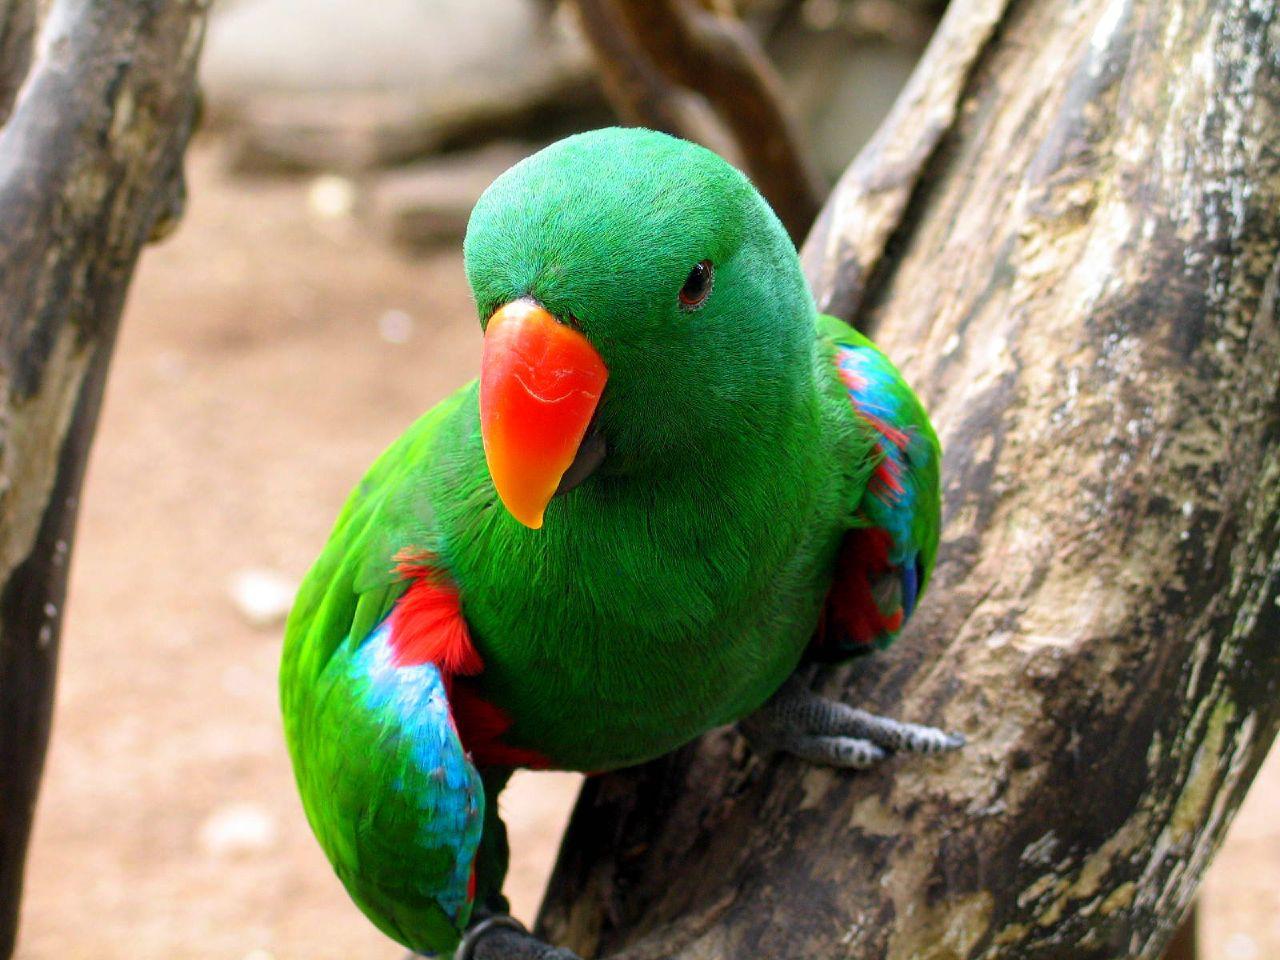 Beautiful parrotcolorful parrotparrot kissing girl full hd beautiful parrotcolorful parrotparrot kissing girl full hd wallpapers 1080p free download voltagebd Images